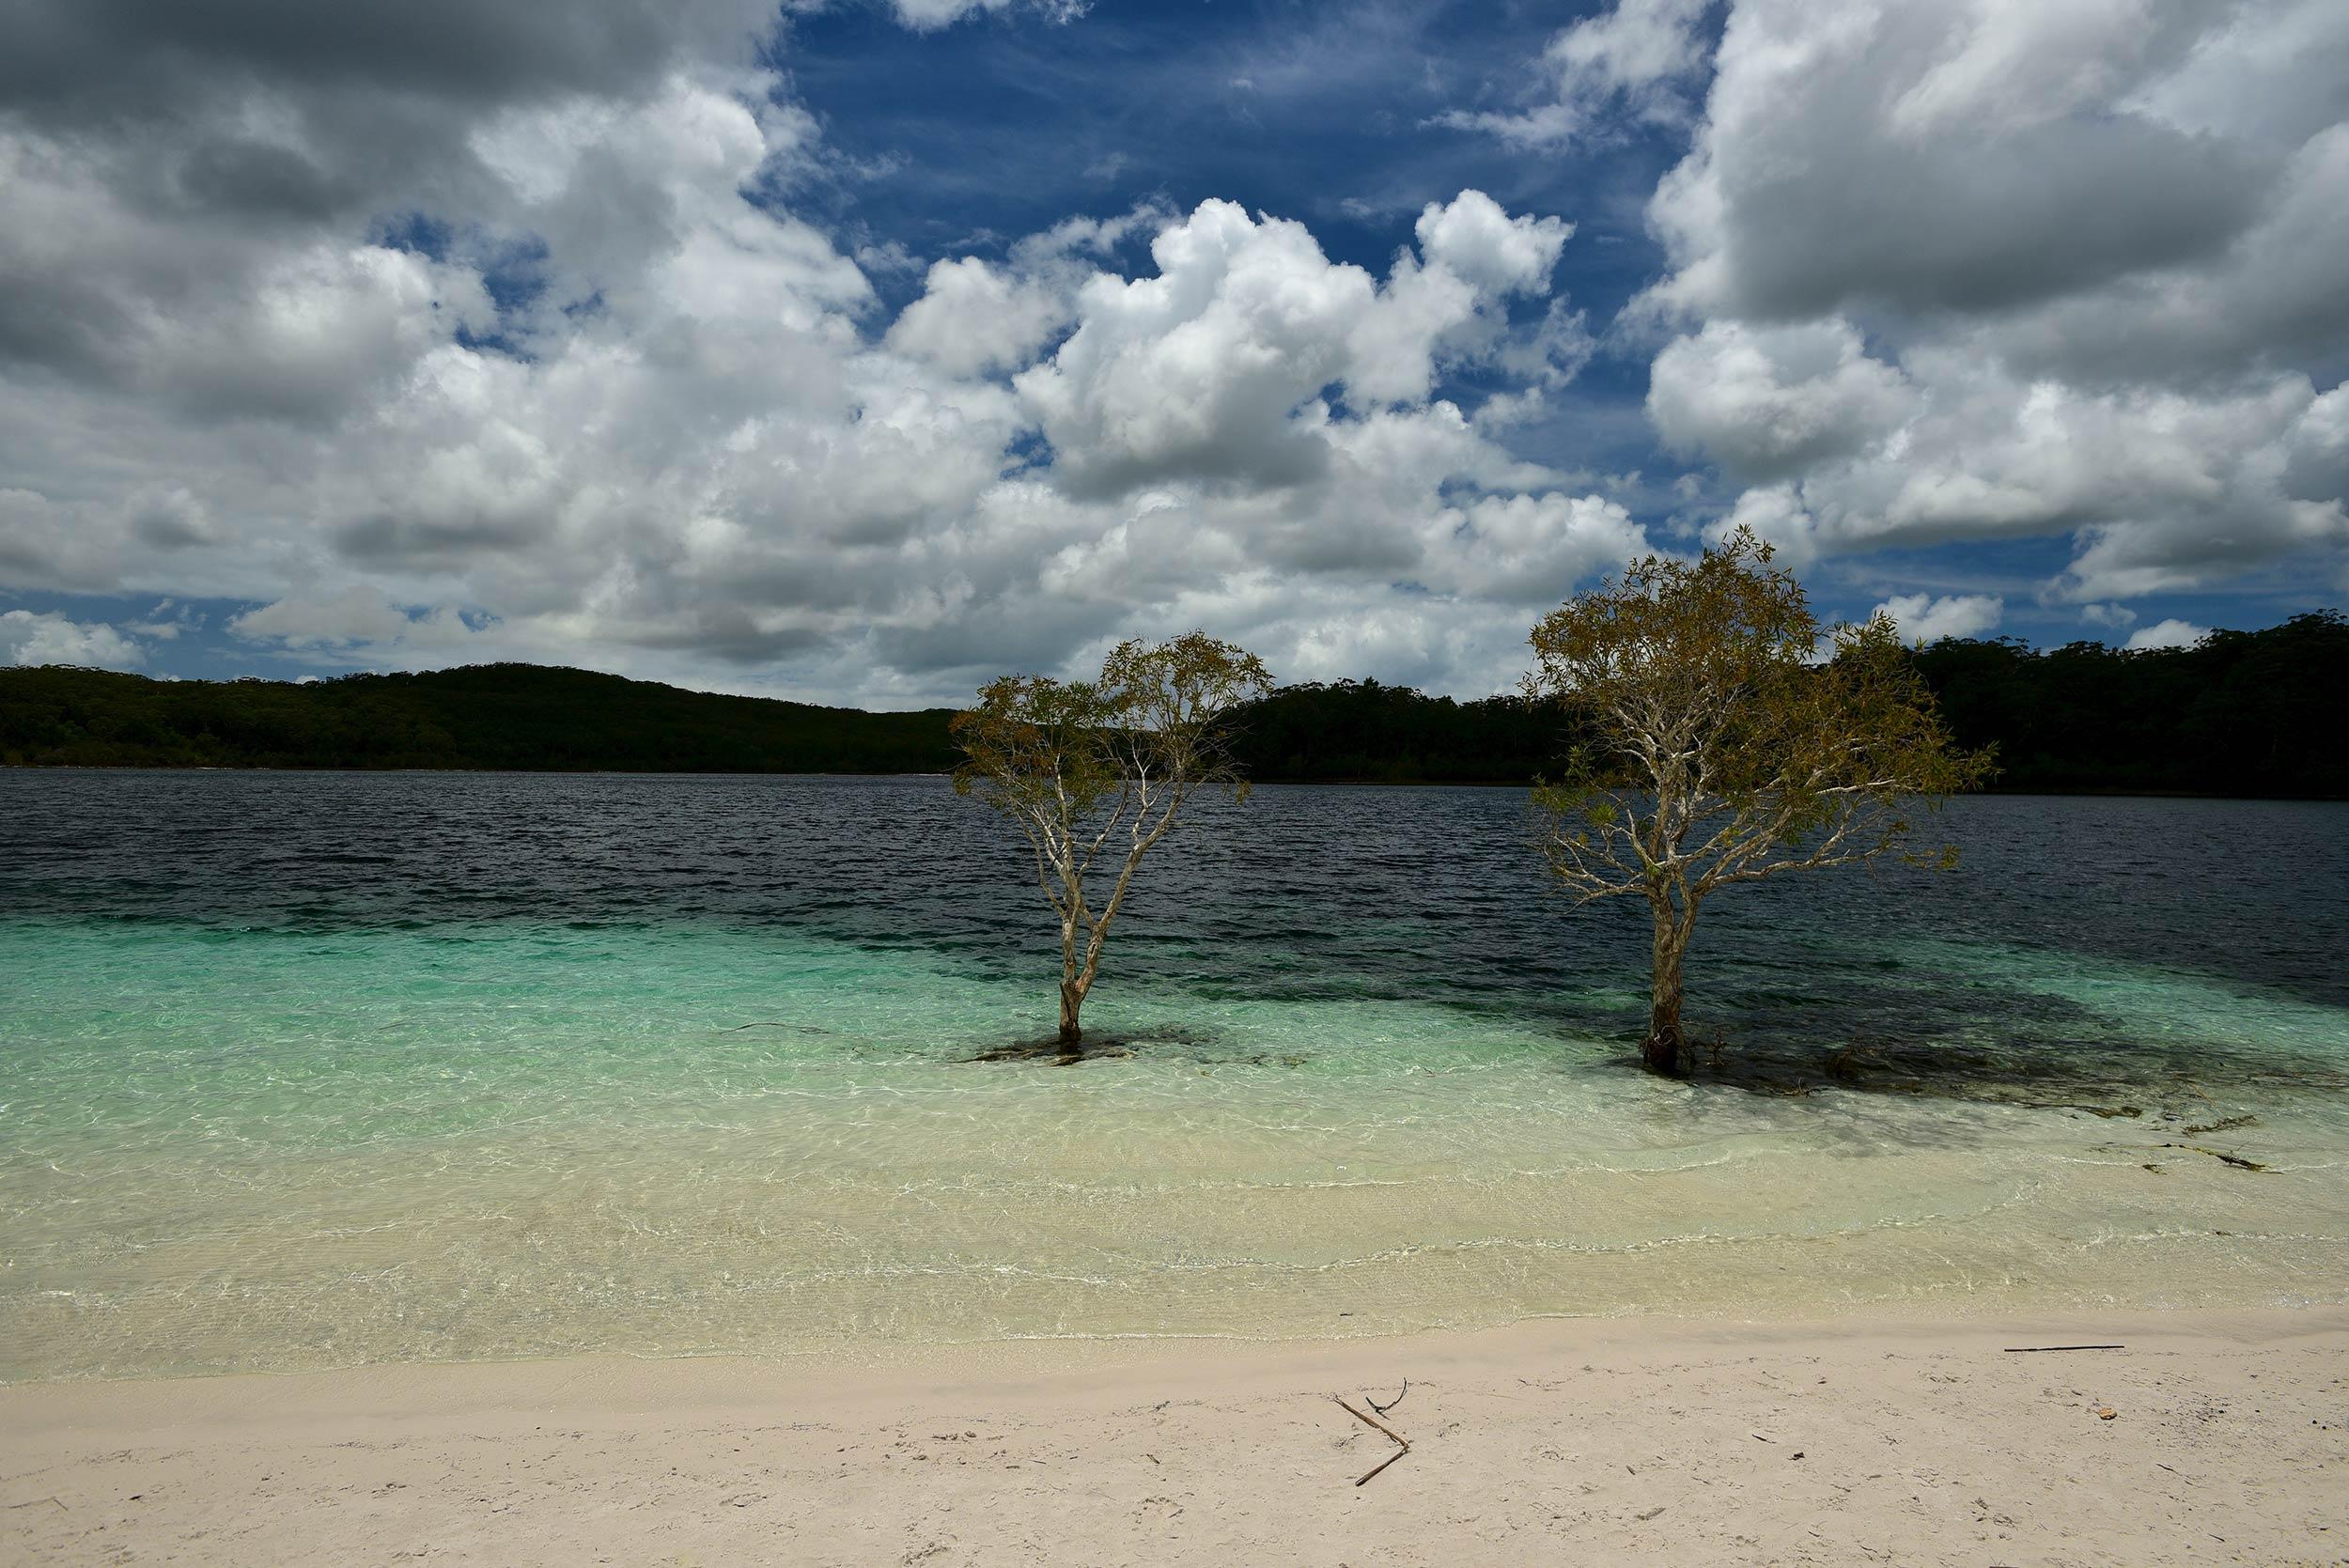 fraser_island_trees_in_water.jpg